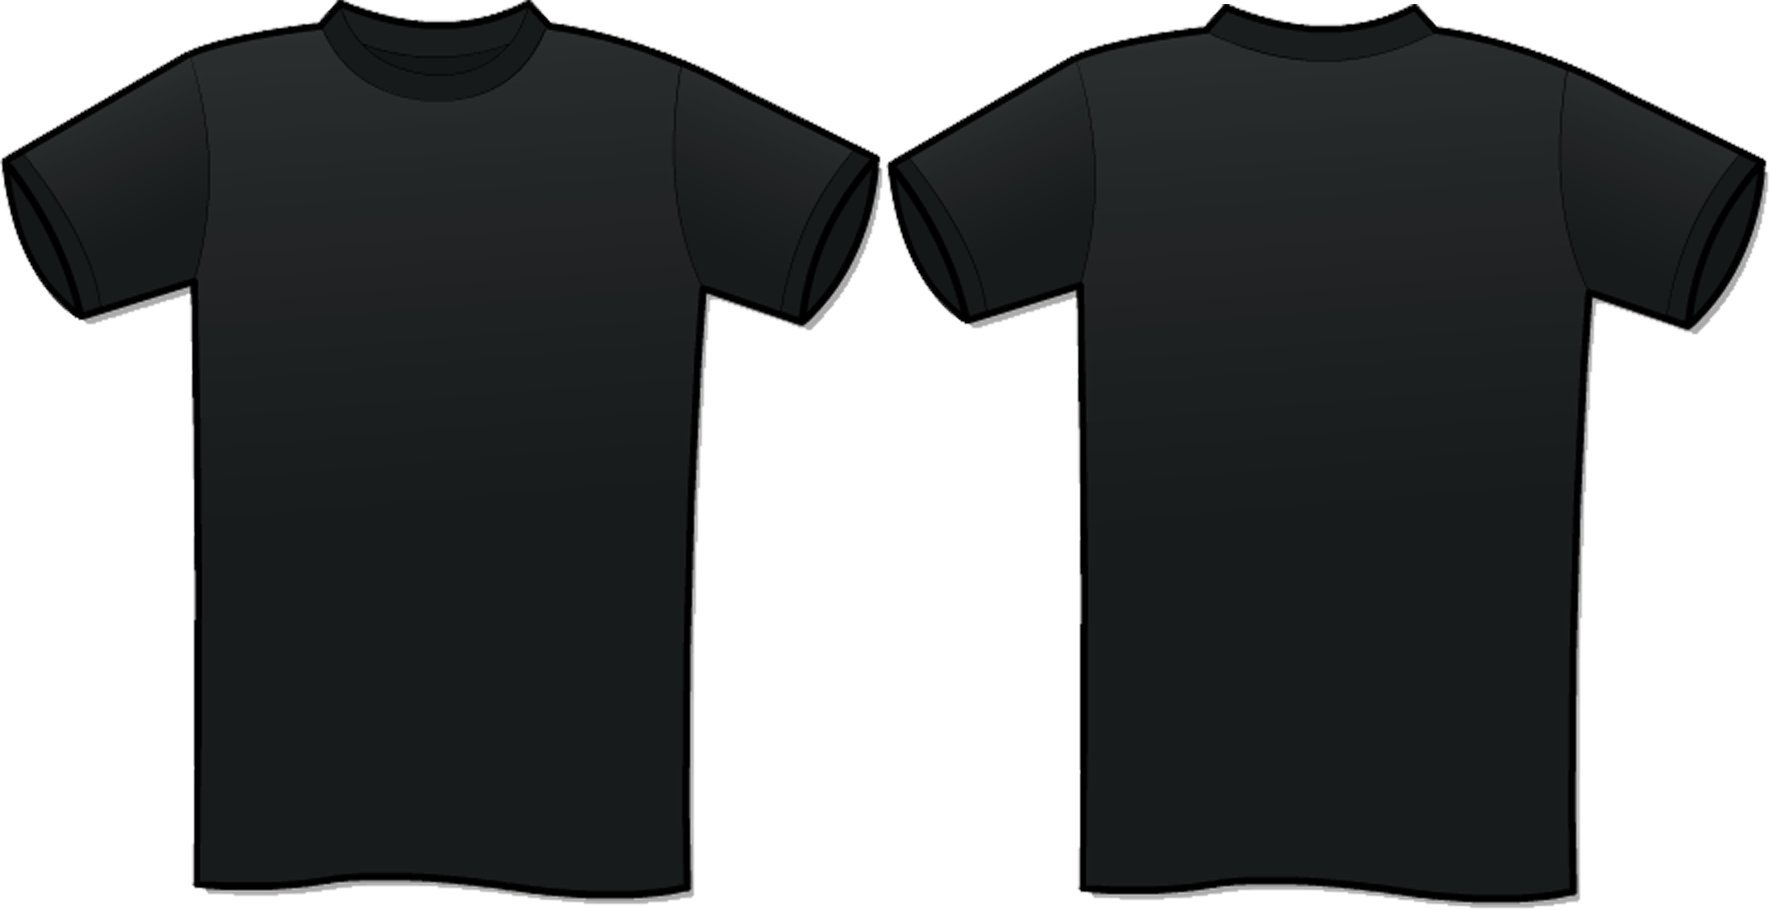 tshirt psd template t shirt photoshop template mock up t shirt